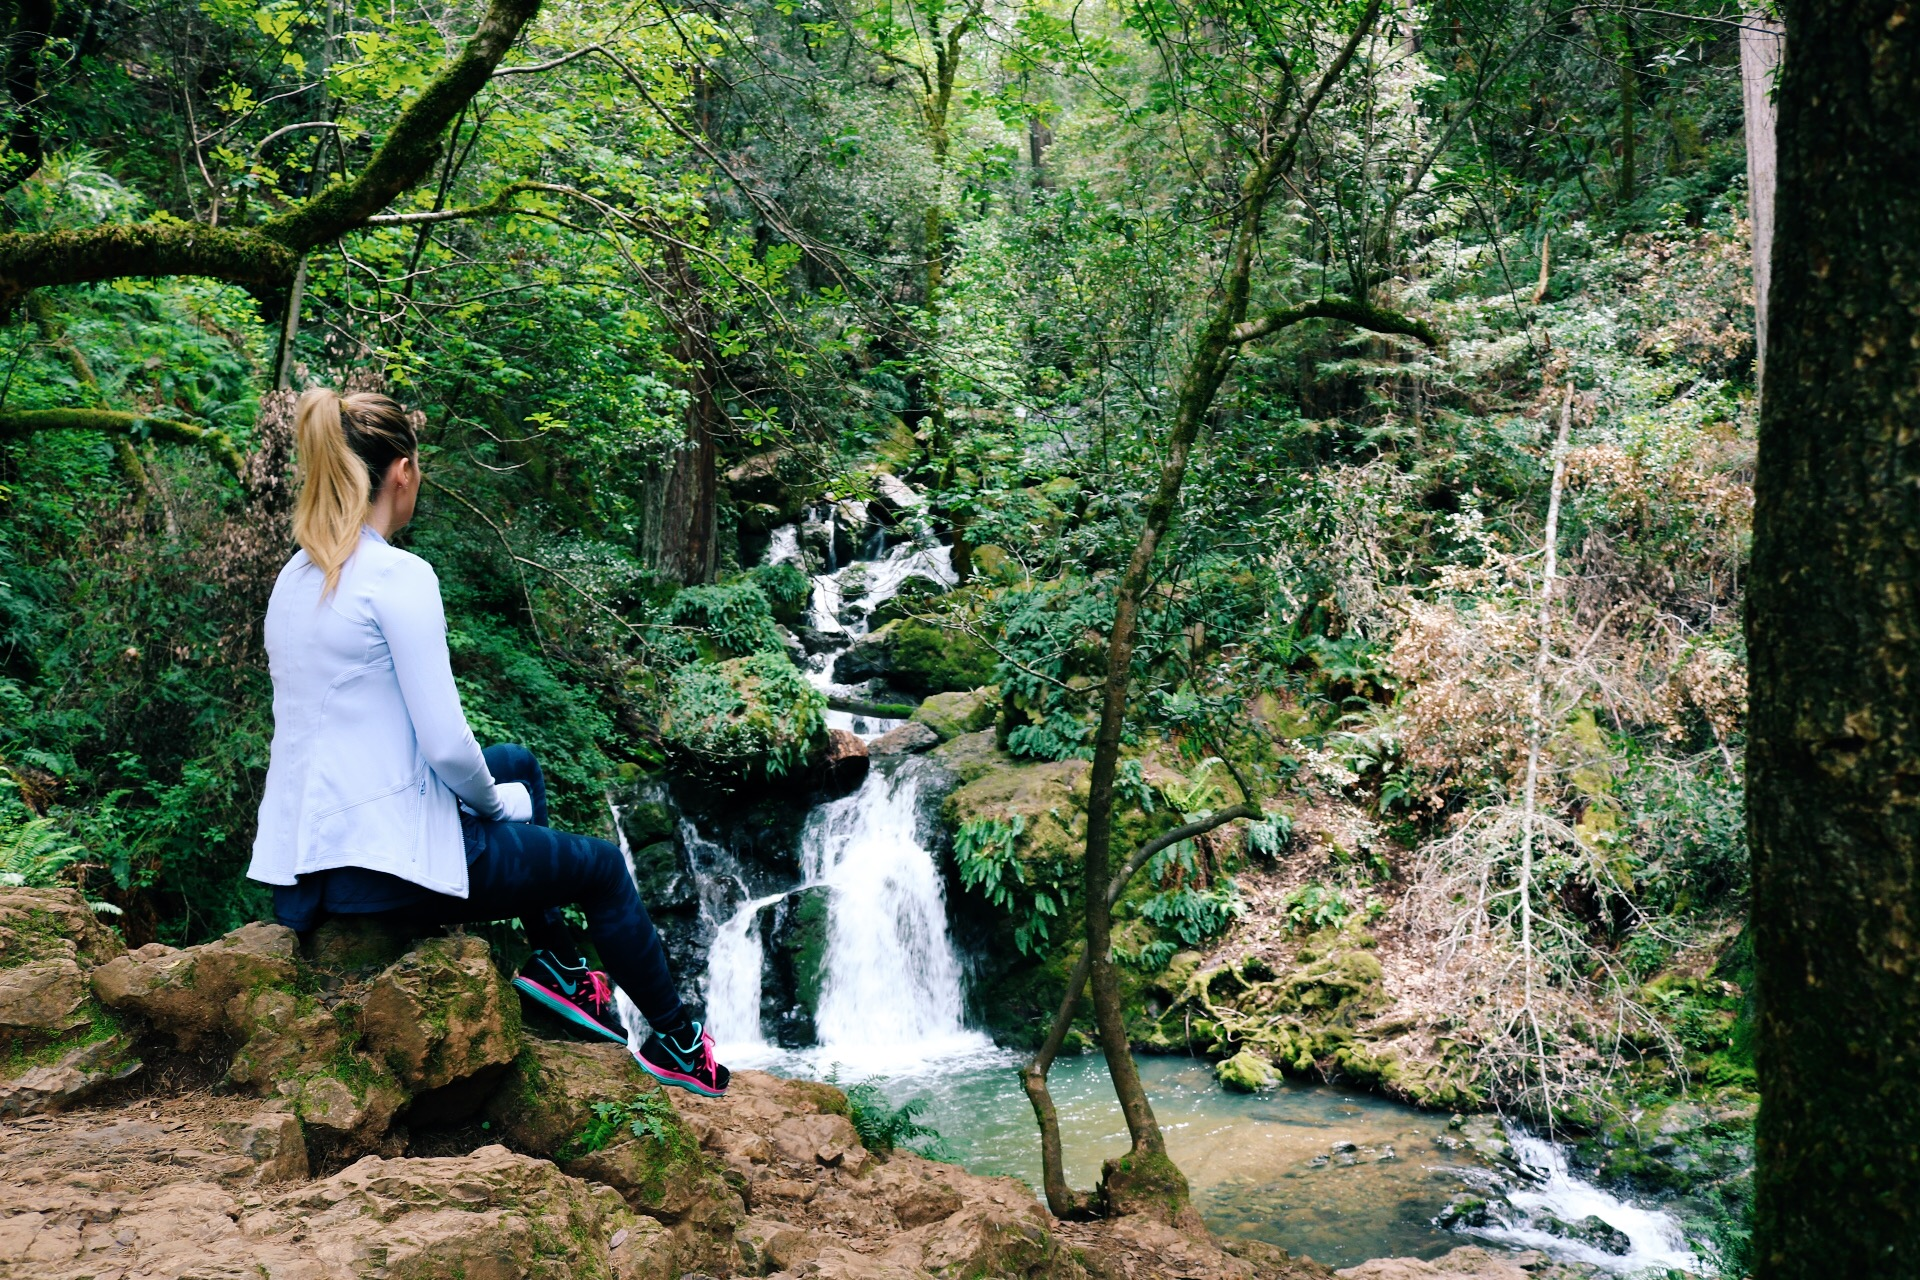 cararact-trail-mount-tam.jpg